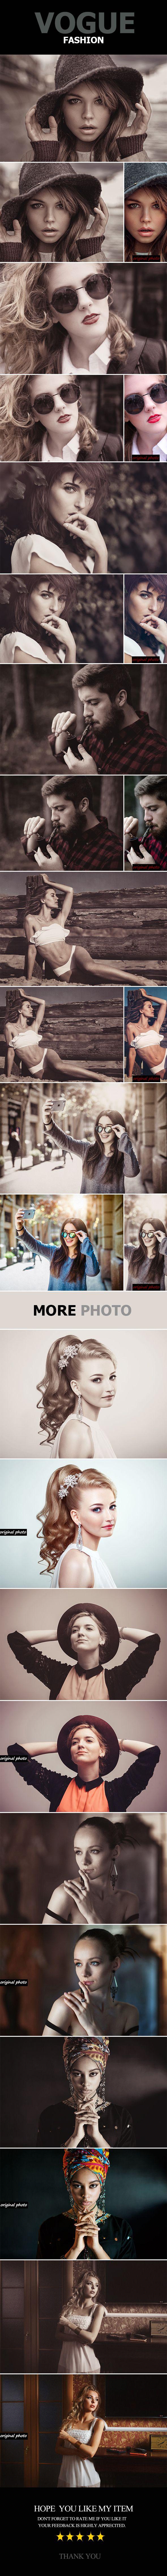 Vogue Fashion Photo Effect Photoshop Action